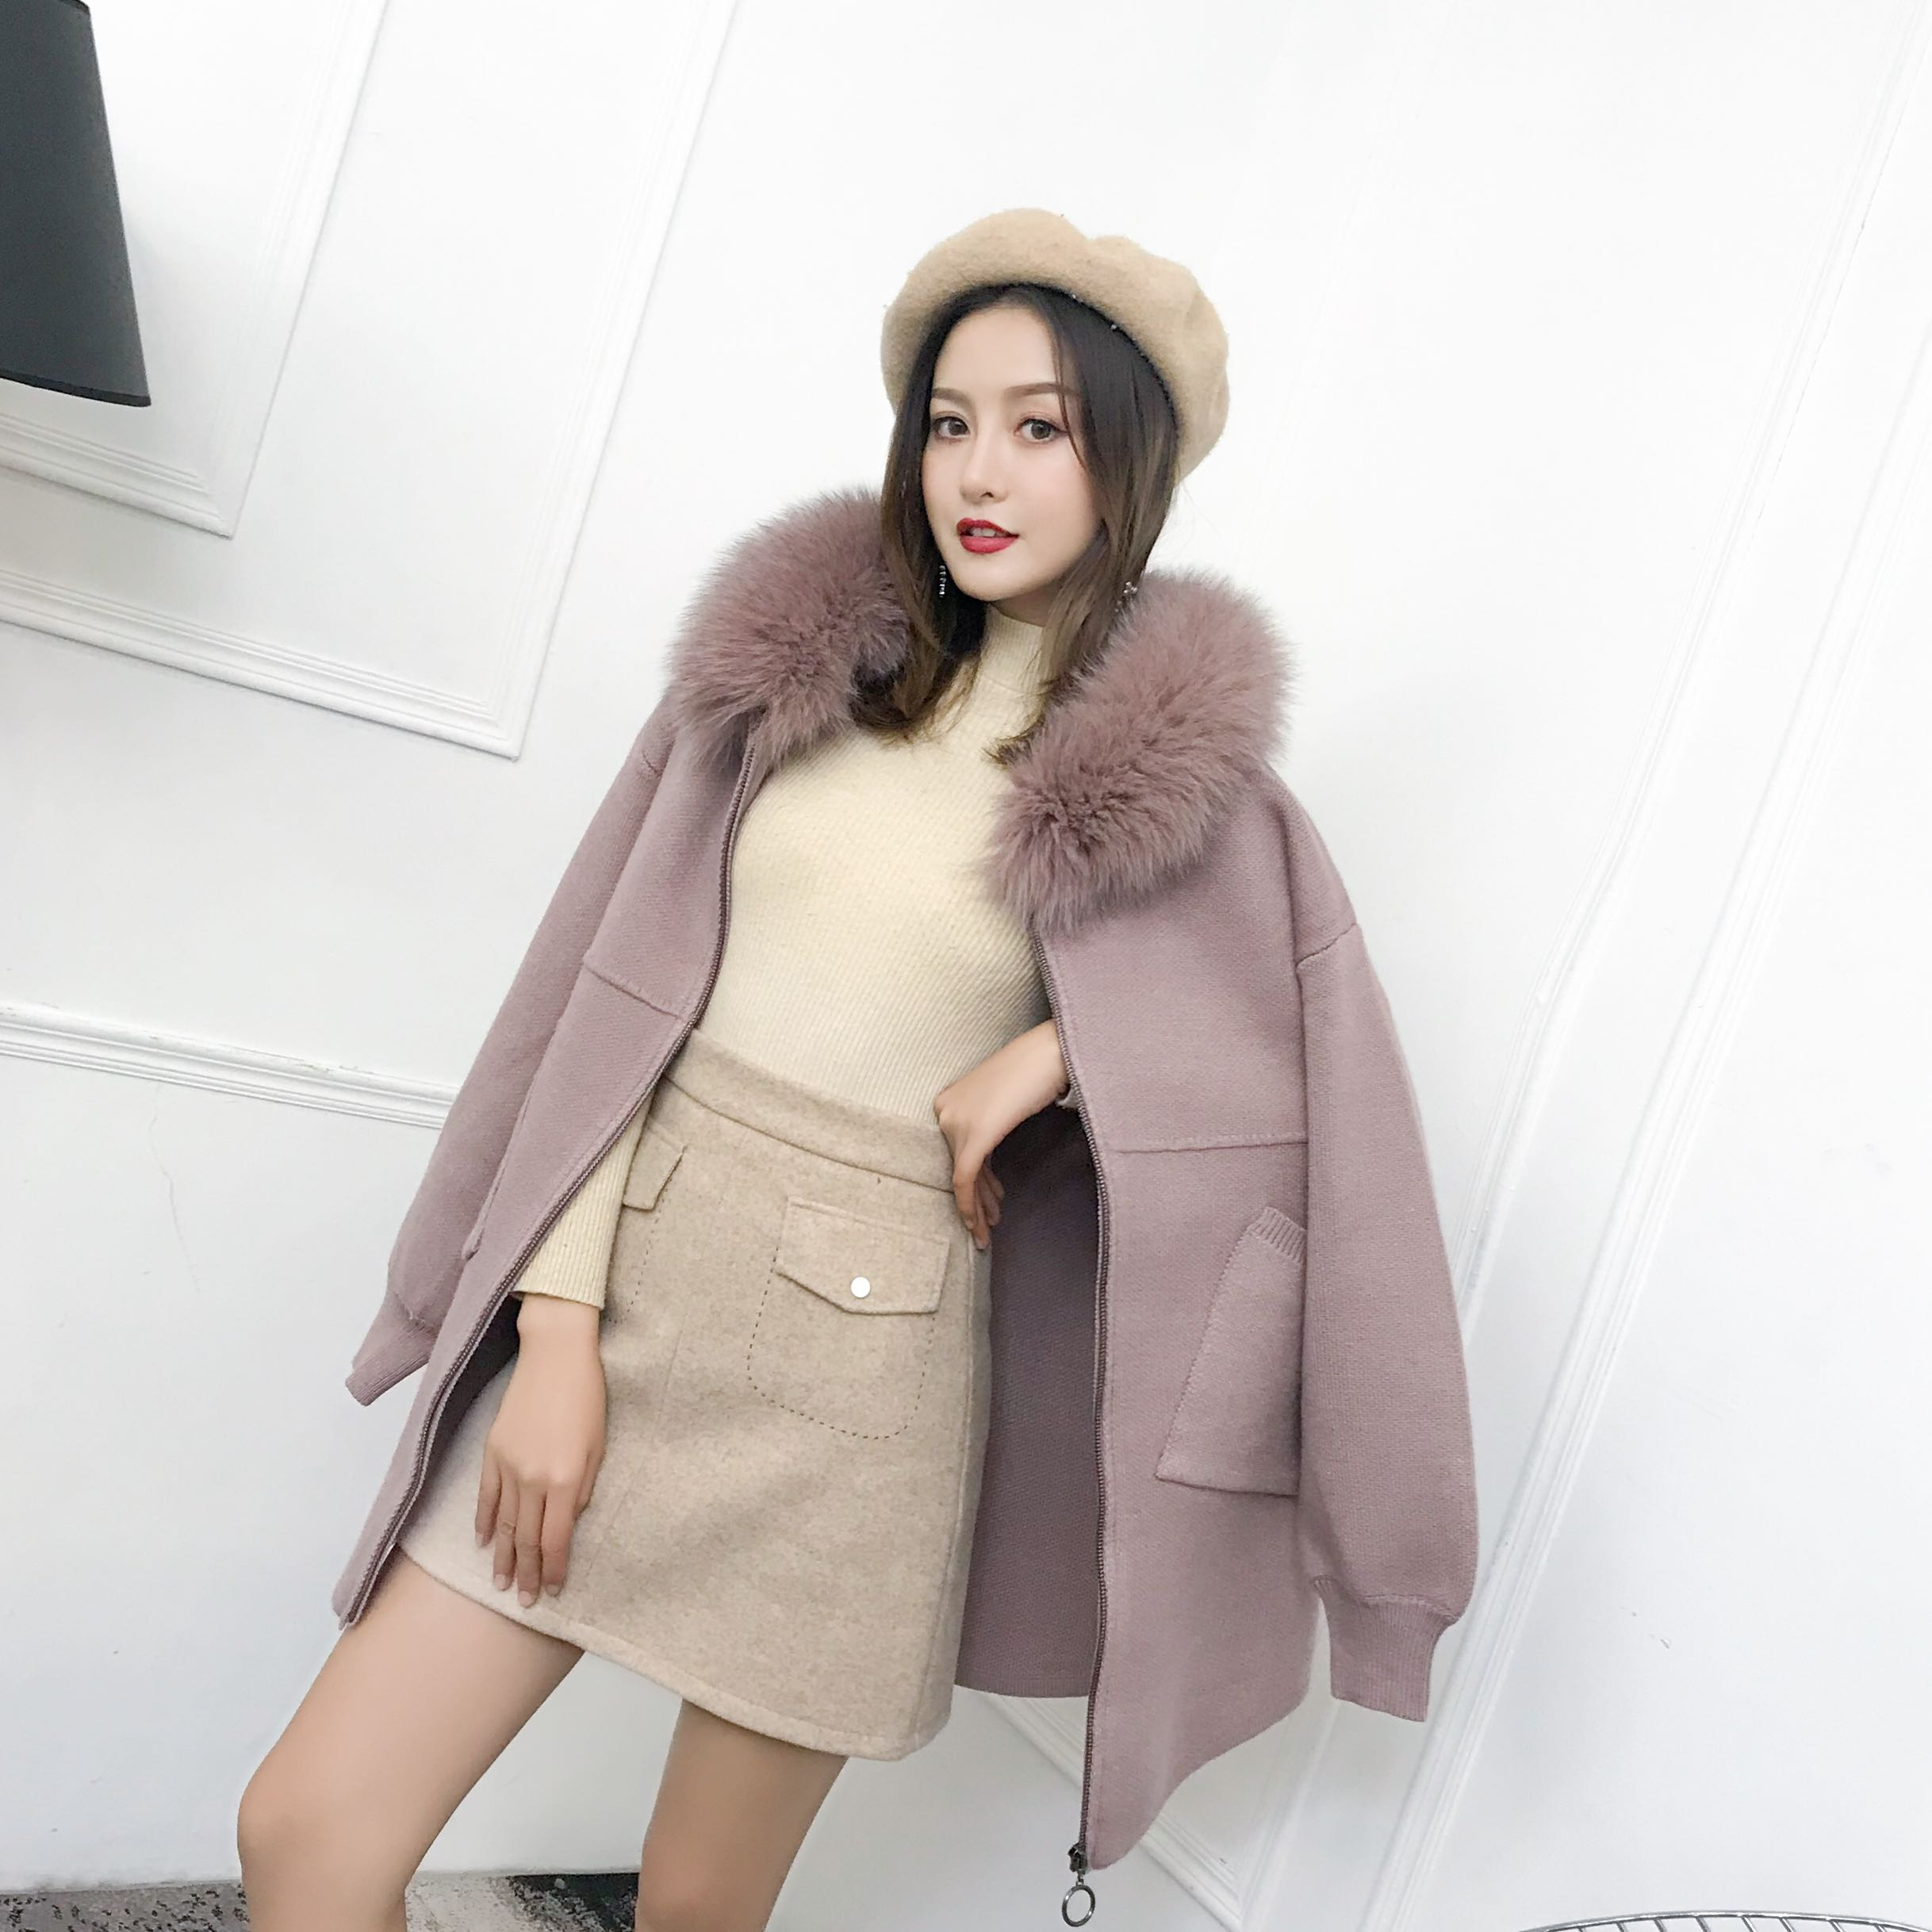 Sweater Women New Sale 2020 Winter Women's Sweater Temperament Fox Fur Collar Hooded Zipper Pocket Thick Cross Strap Mid-length enlarge